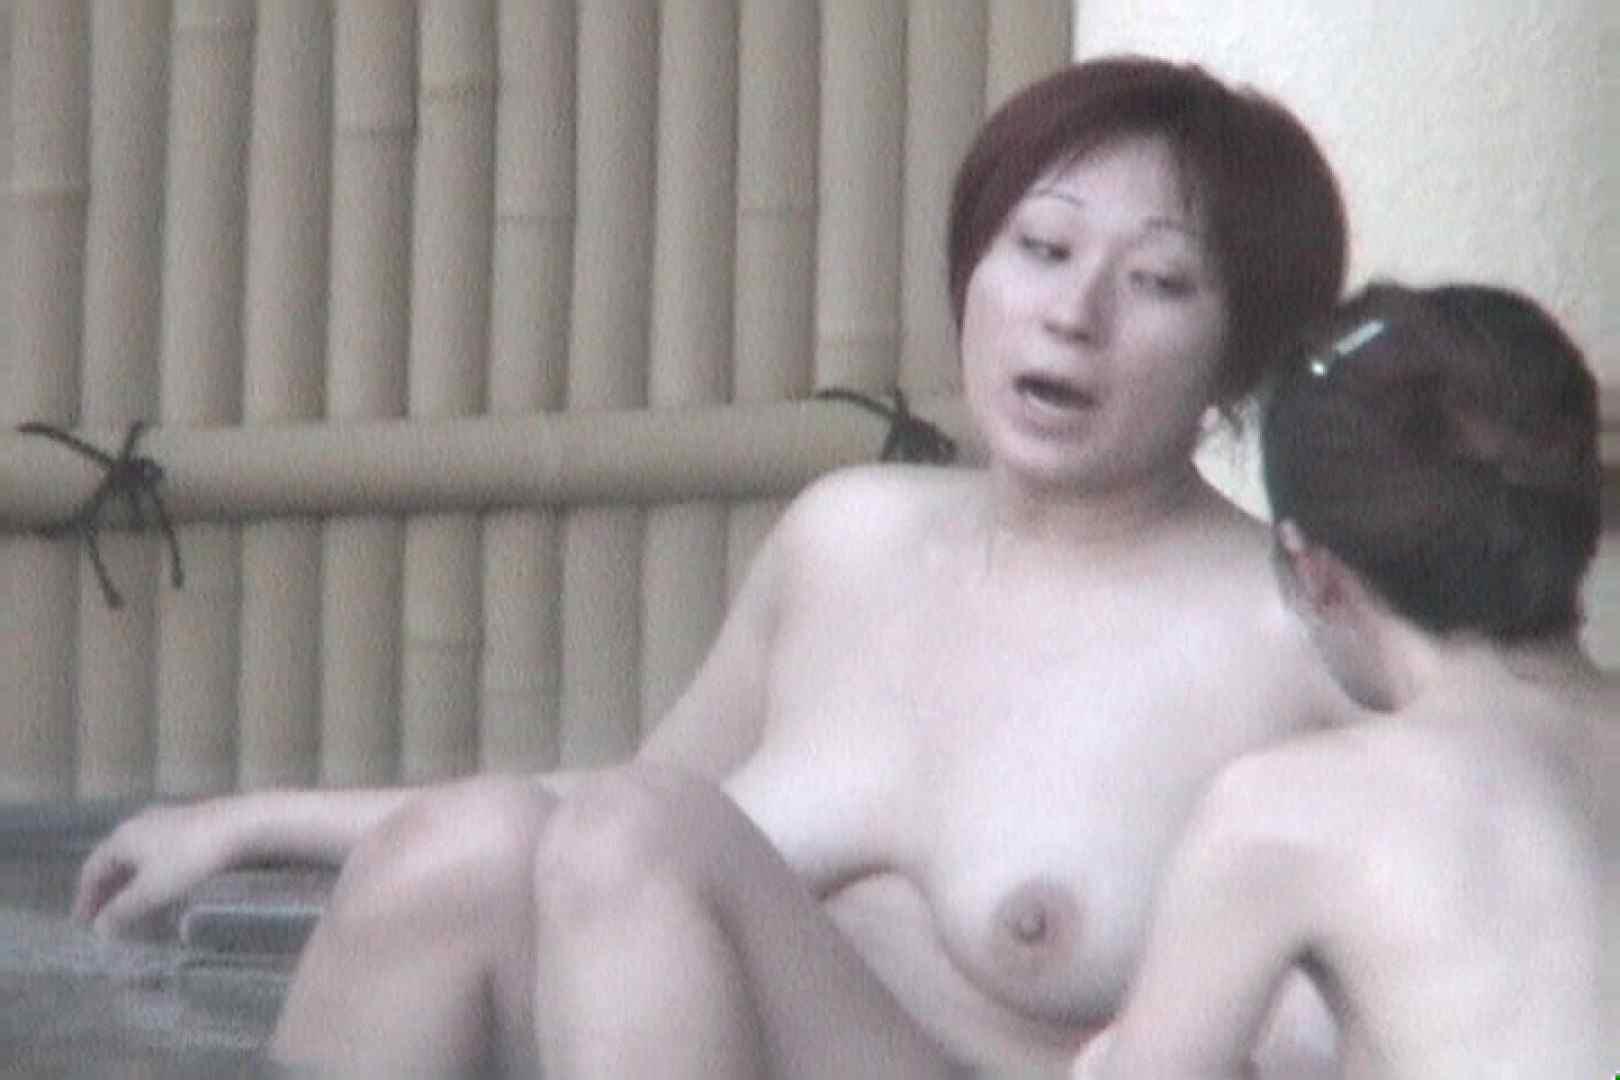 Aquaな露天風呂Vol.561 エッチな盗撮 セックス画像 80pic 68